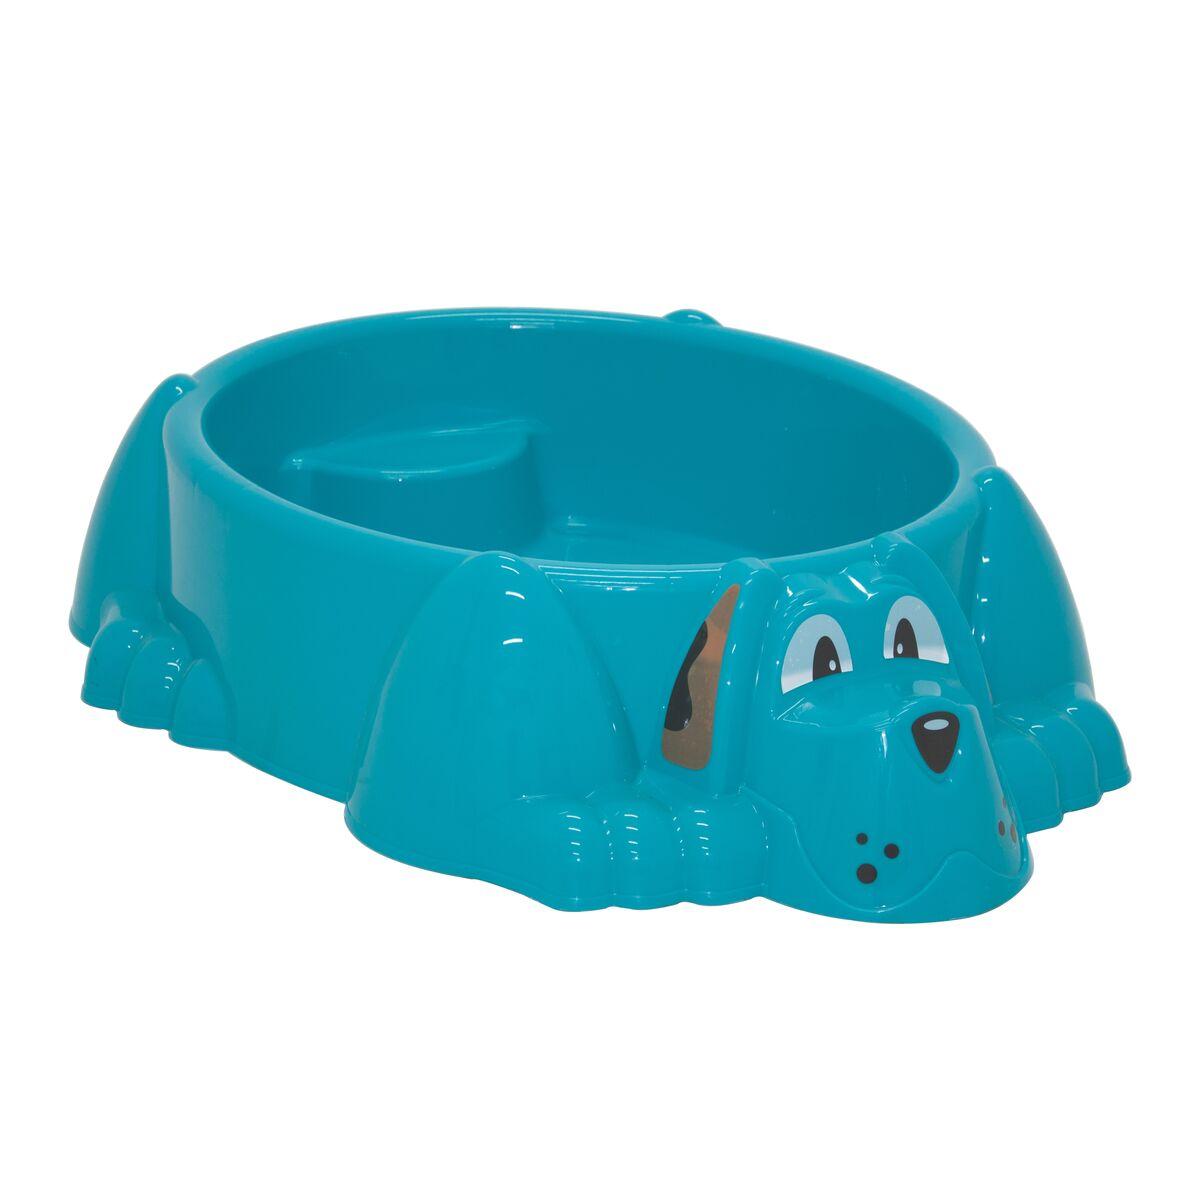 Blue Pool Aquadog